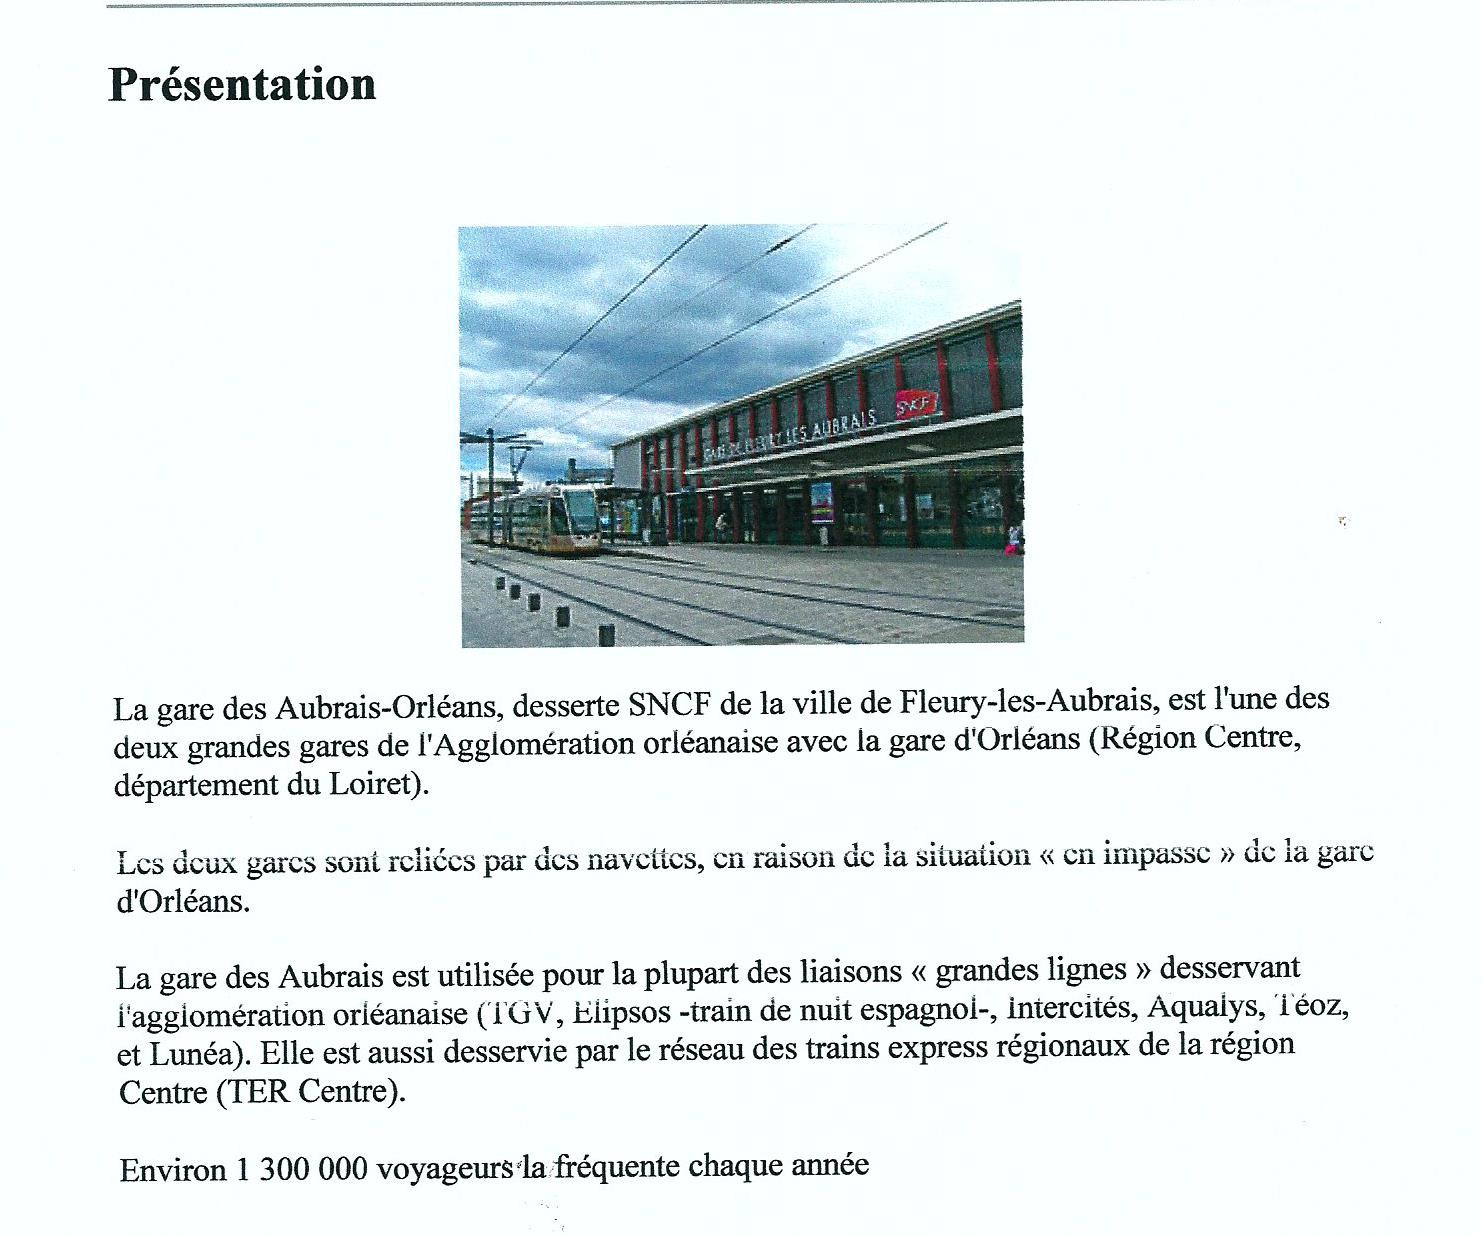 Scan Histoire de la Gare des Aubrais 2017 (22.12.2017).jpg